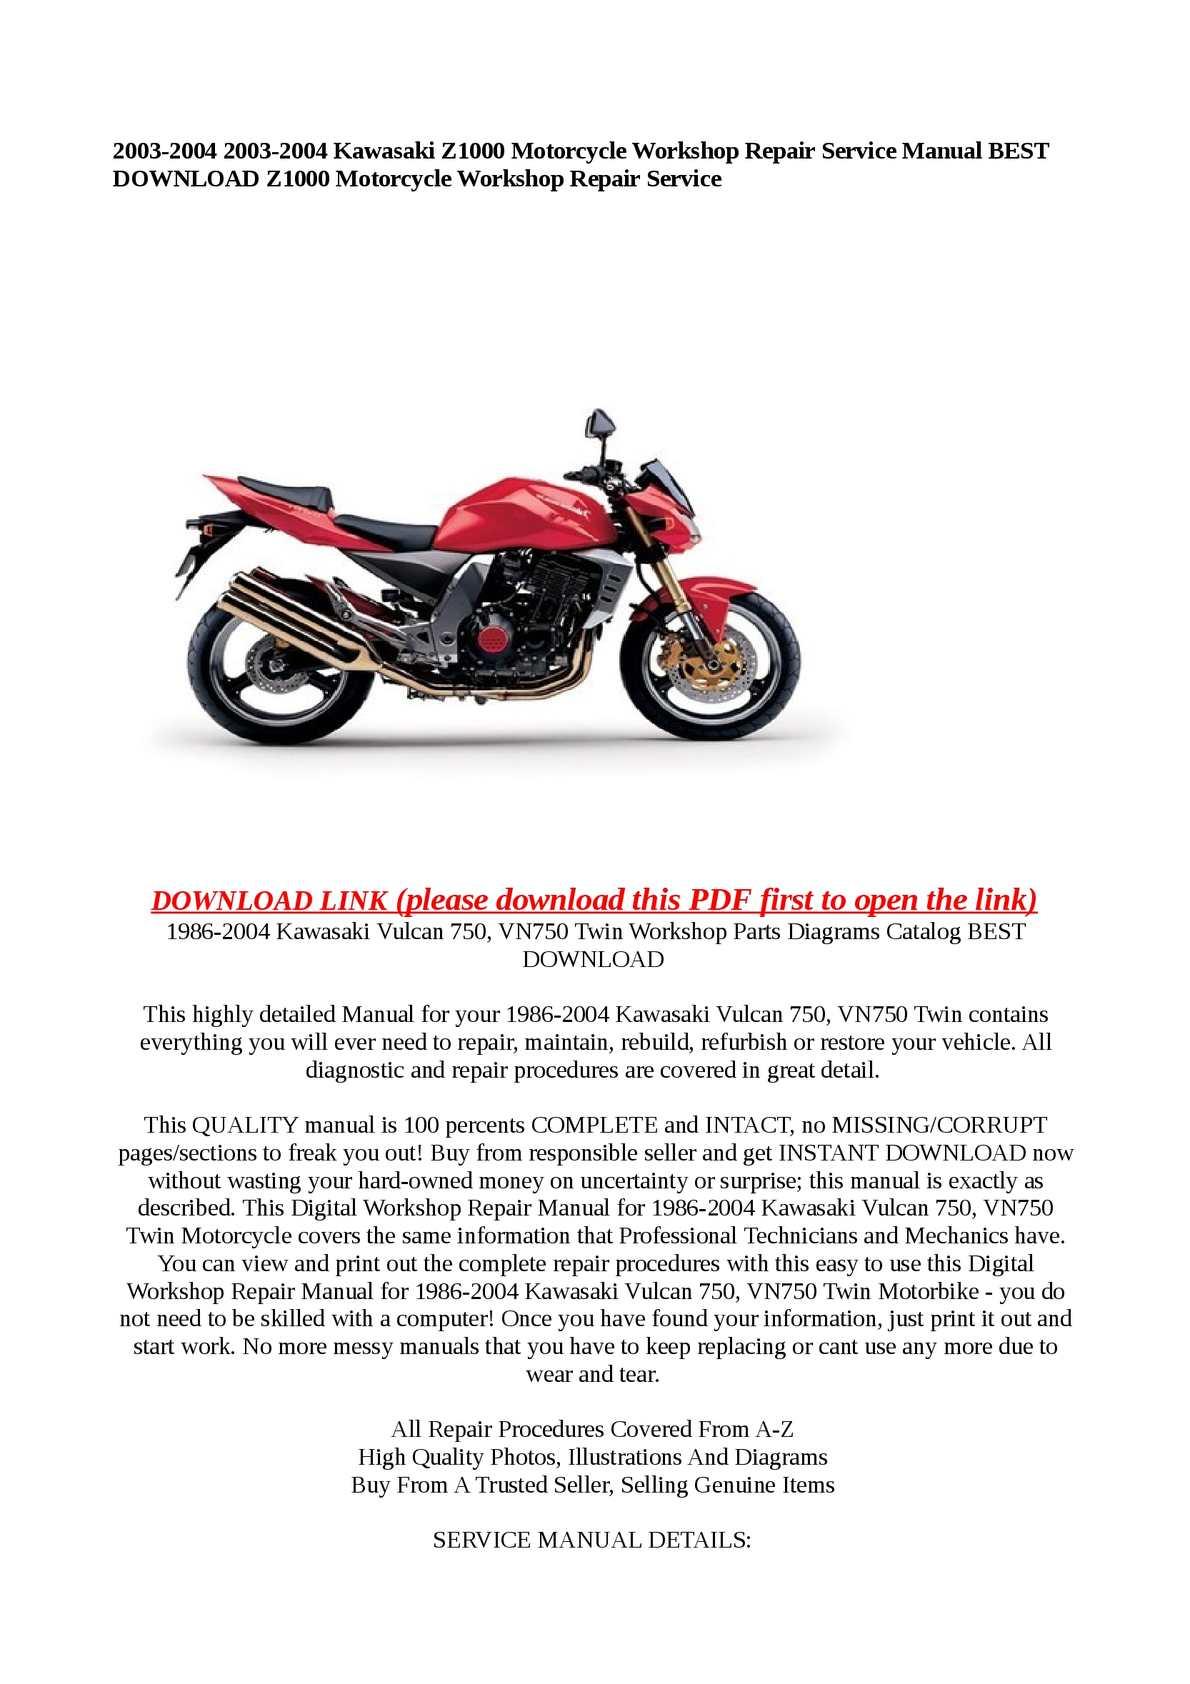 2004 Kawasaki Z1000 Wiring Diagram Manual E Books 1981 Kz650 Librarycalamo 2003 Motorcycle Workshop Repair